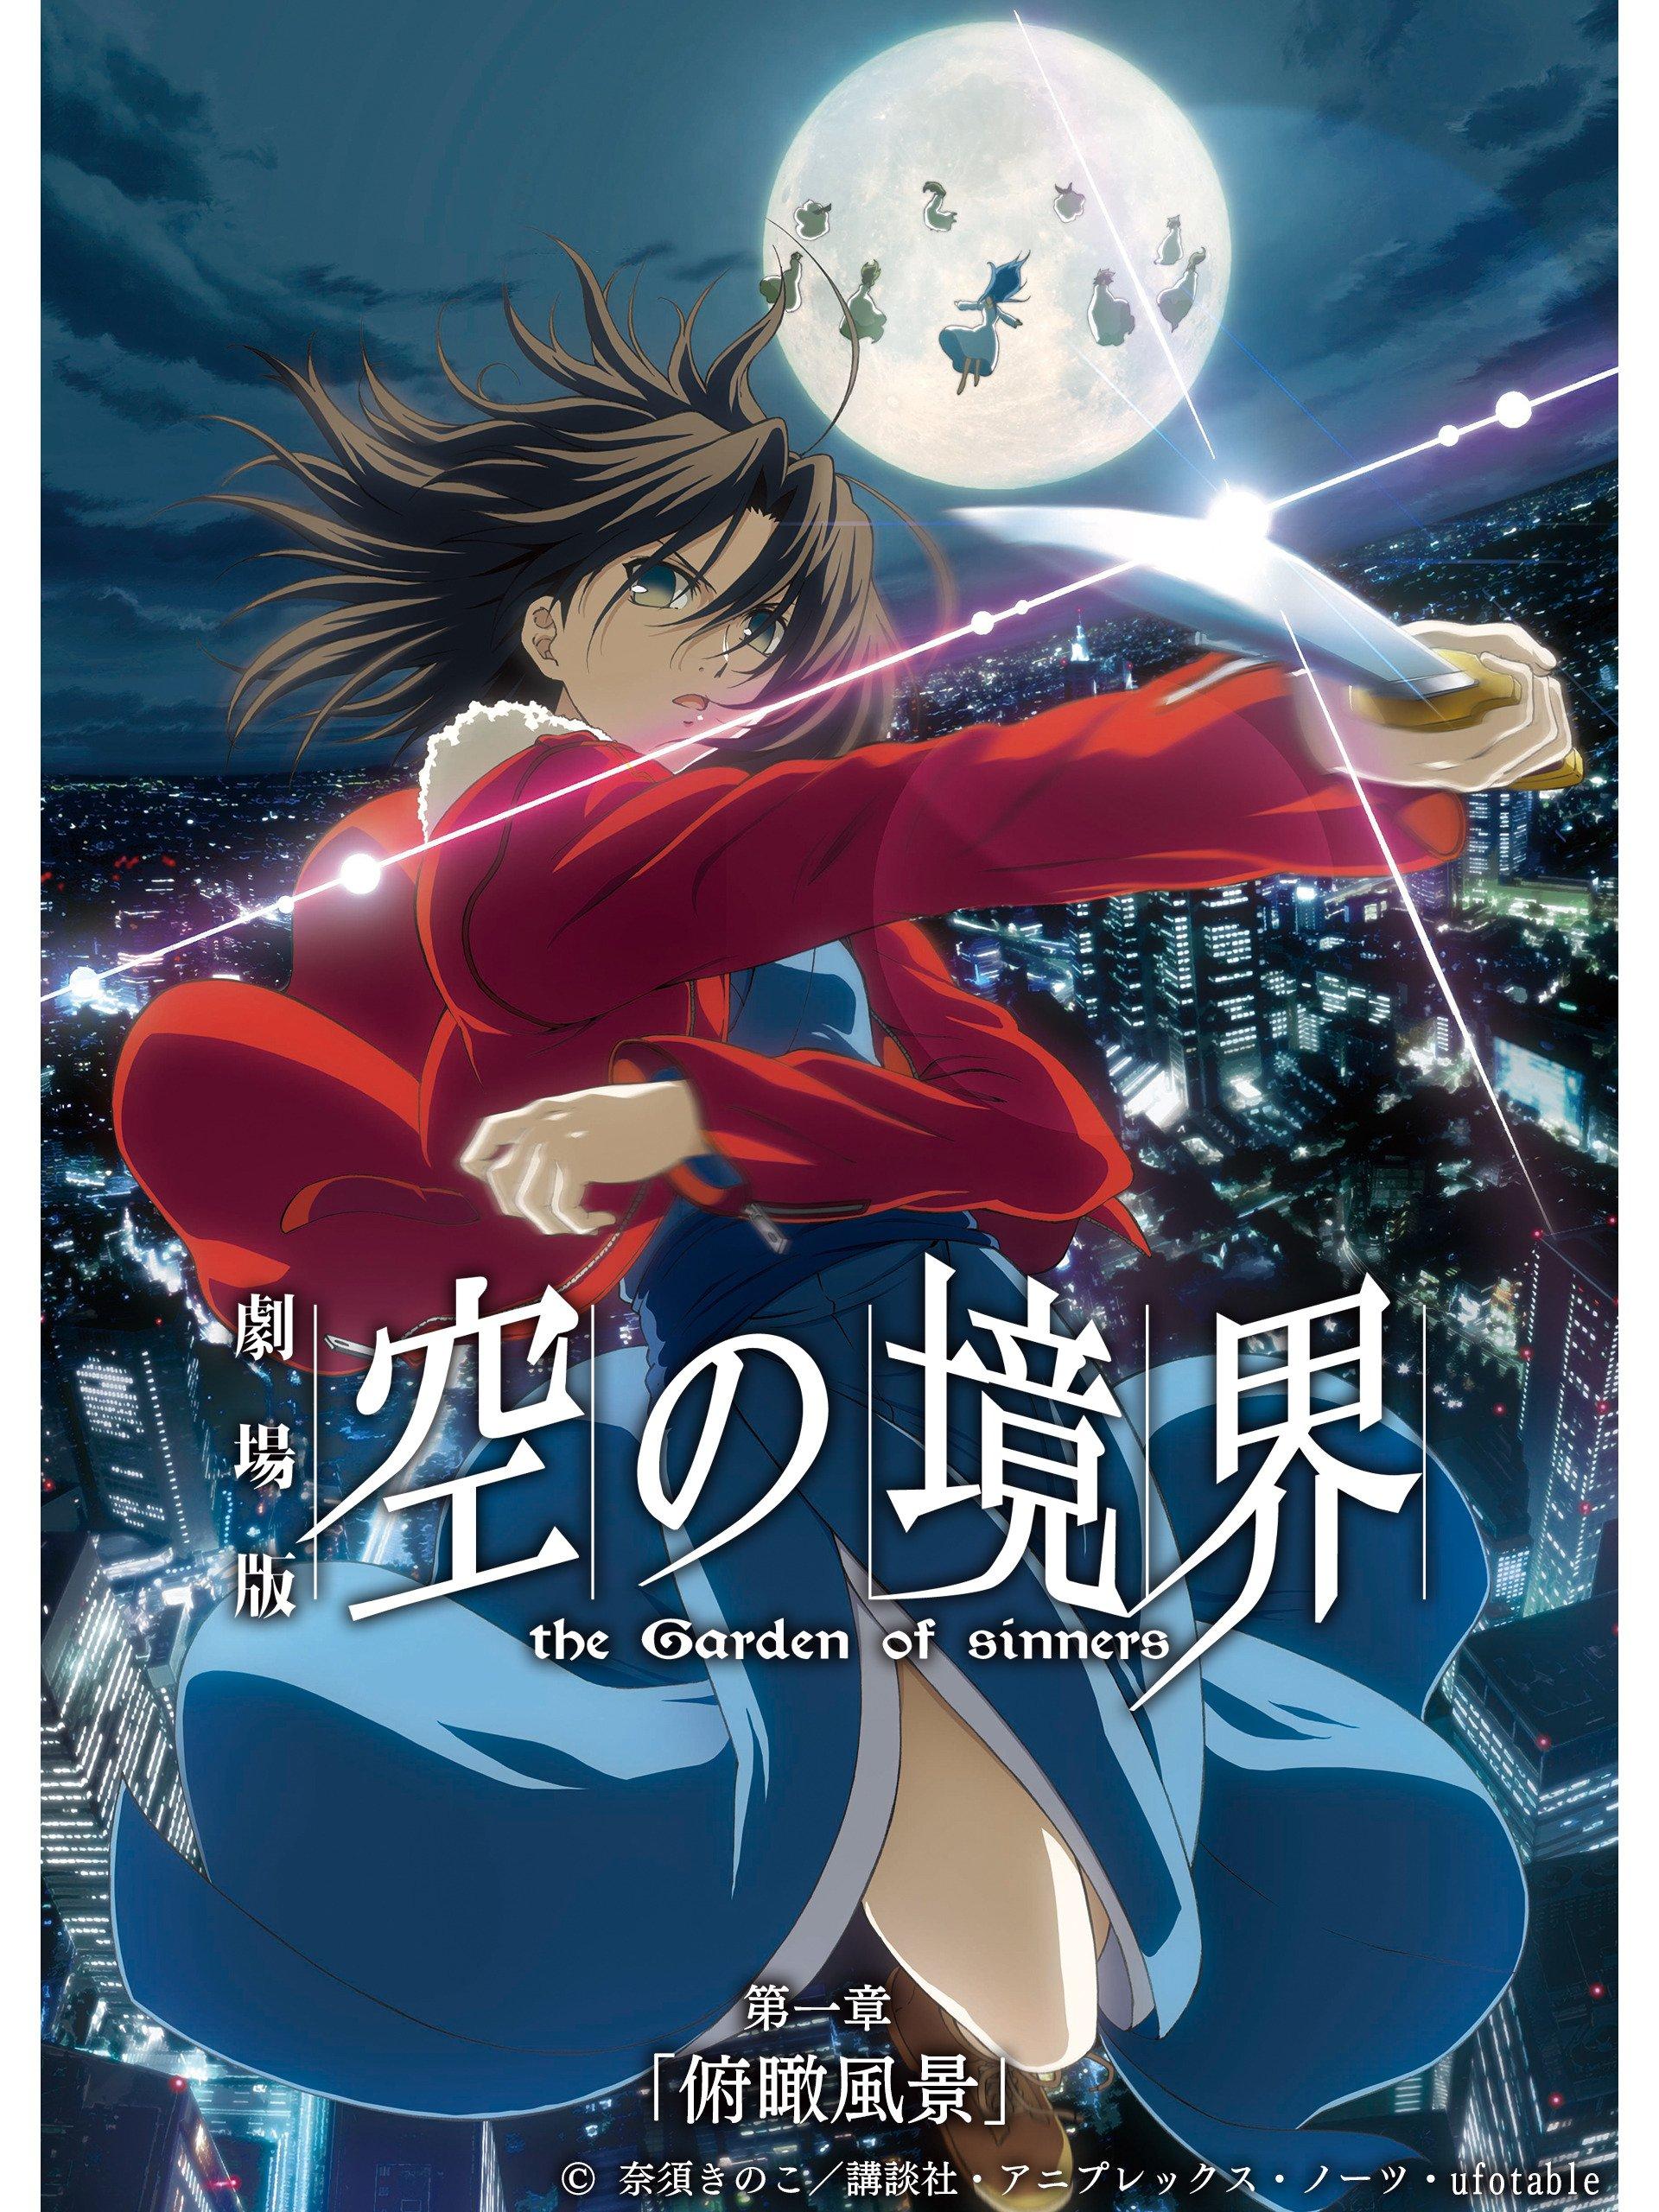 Amazon.co.jp 劇場版「空の境界」第一章 俯瞰風景 坂本真綾